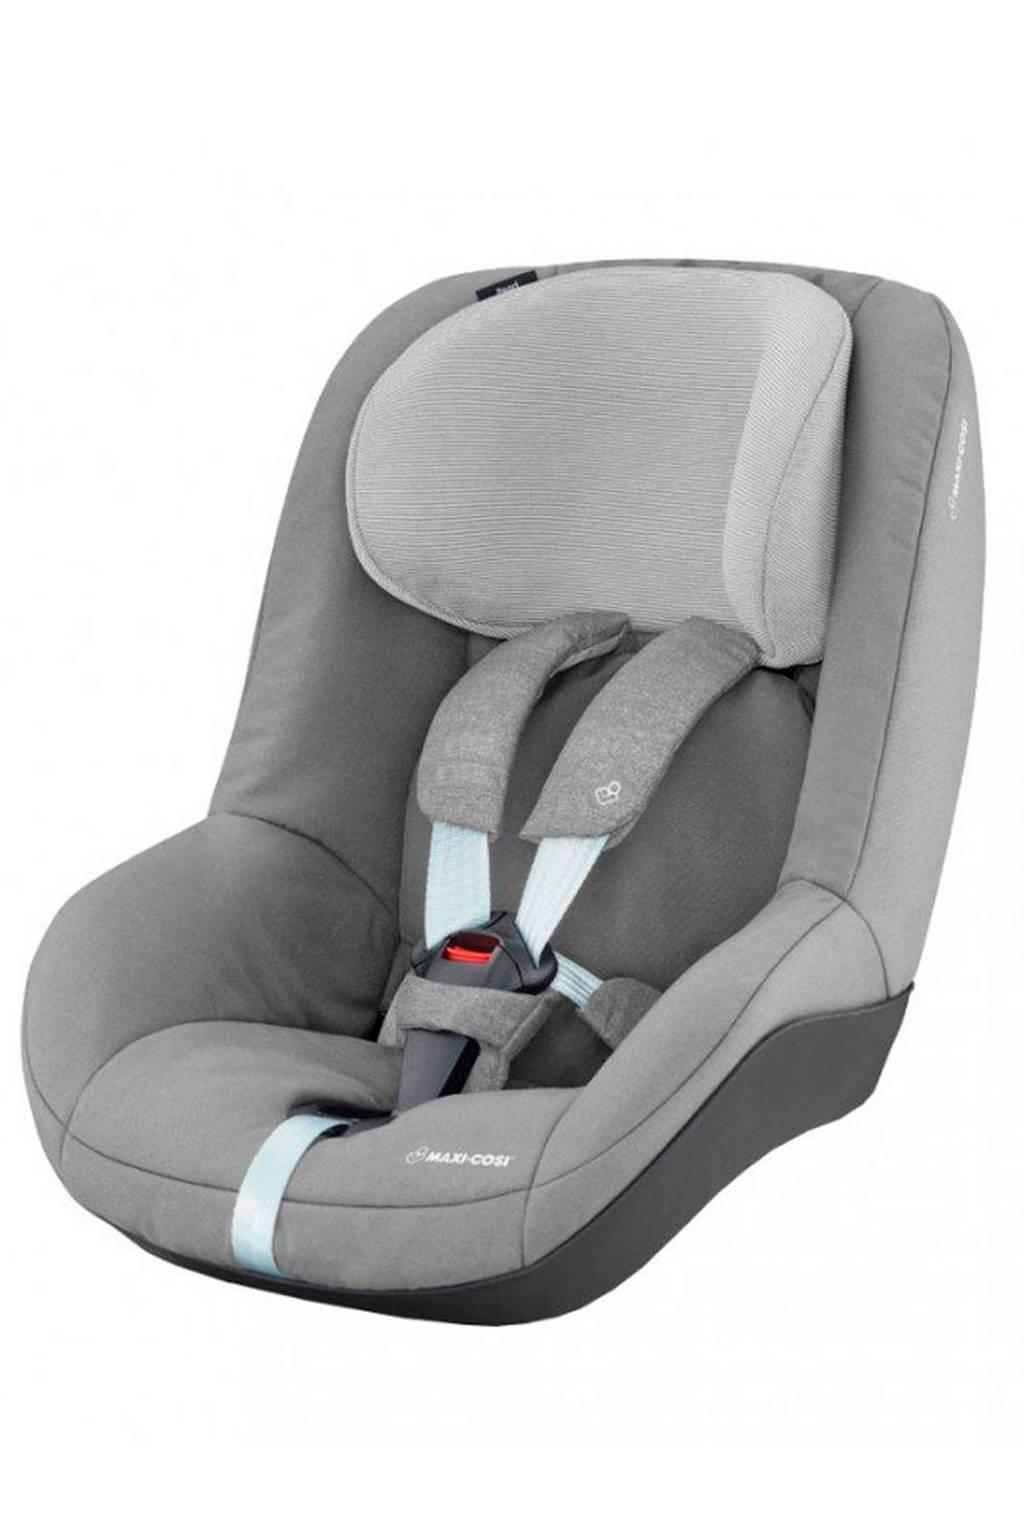 Maxi Cosi Autostoel Groep 1.Maxi Cosi Pearl Autostoel Groep 1 Nomad Grey Wehkamp